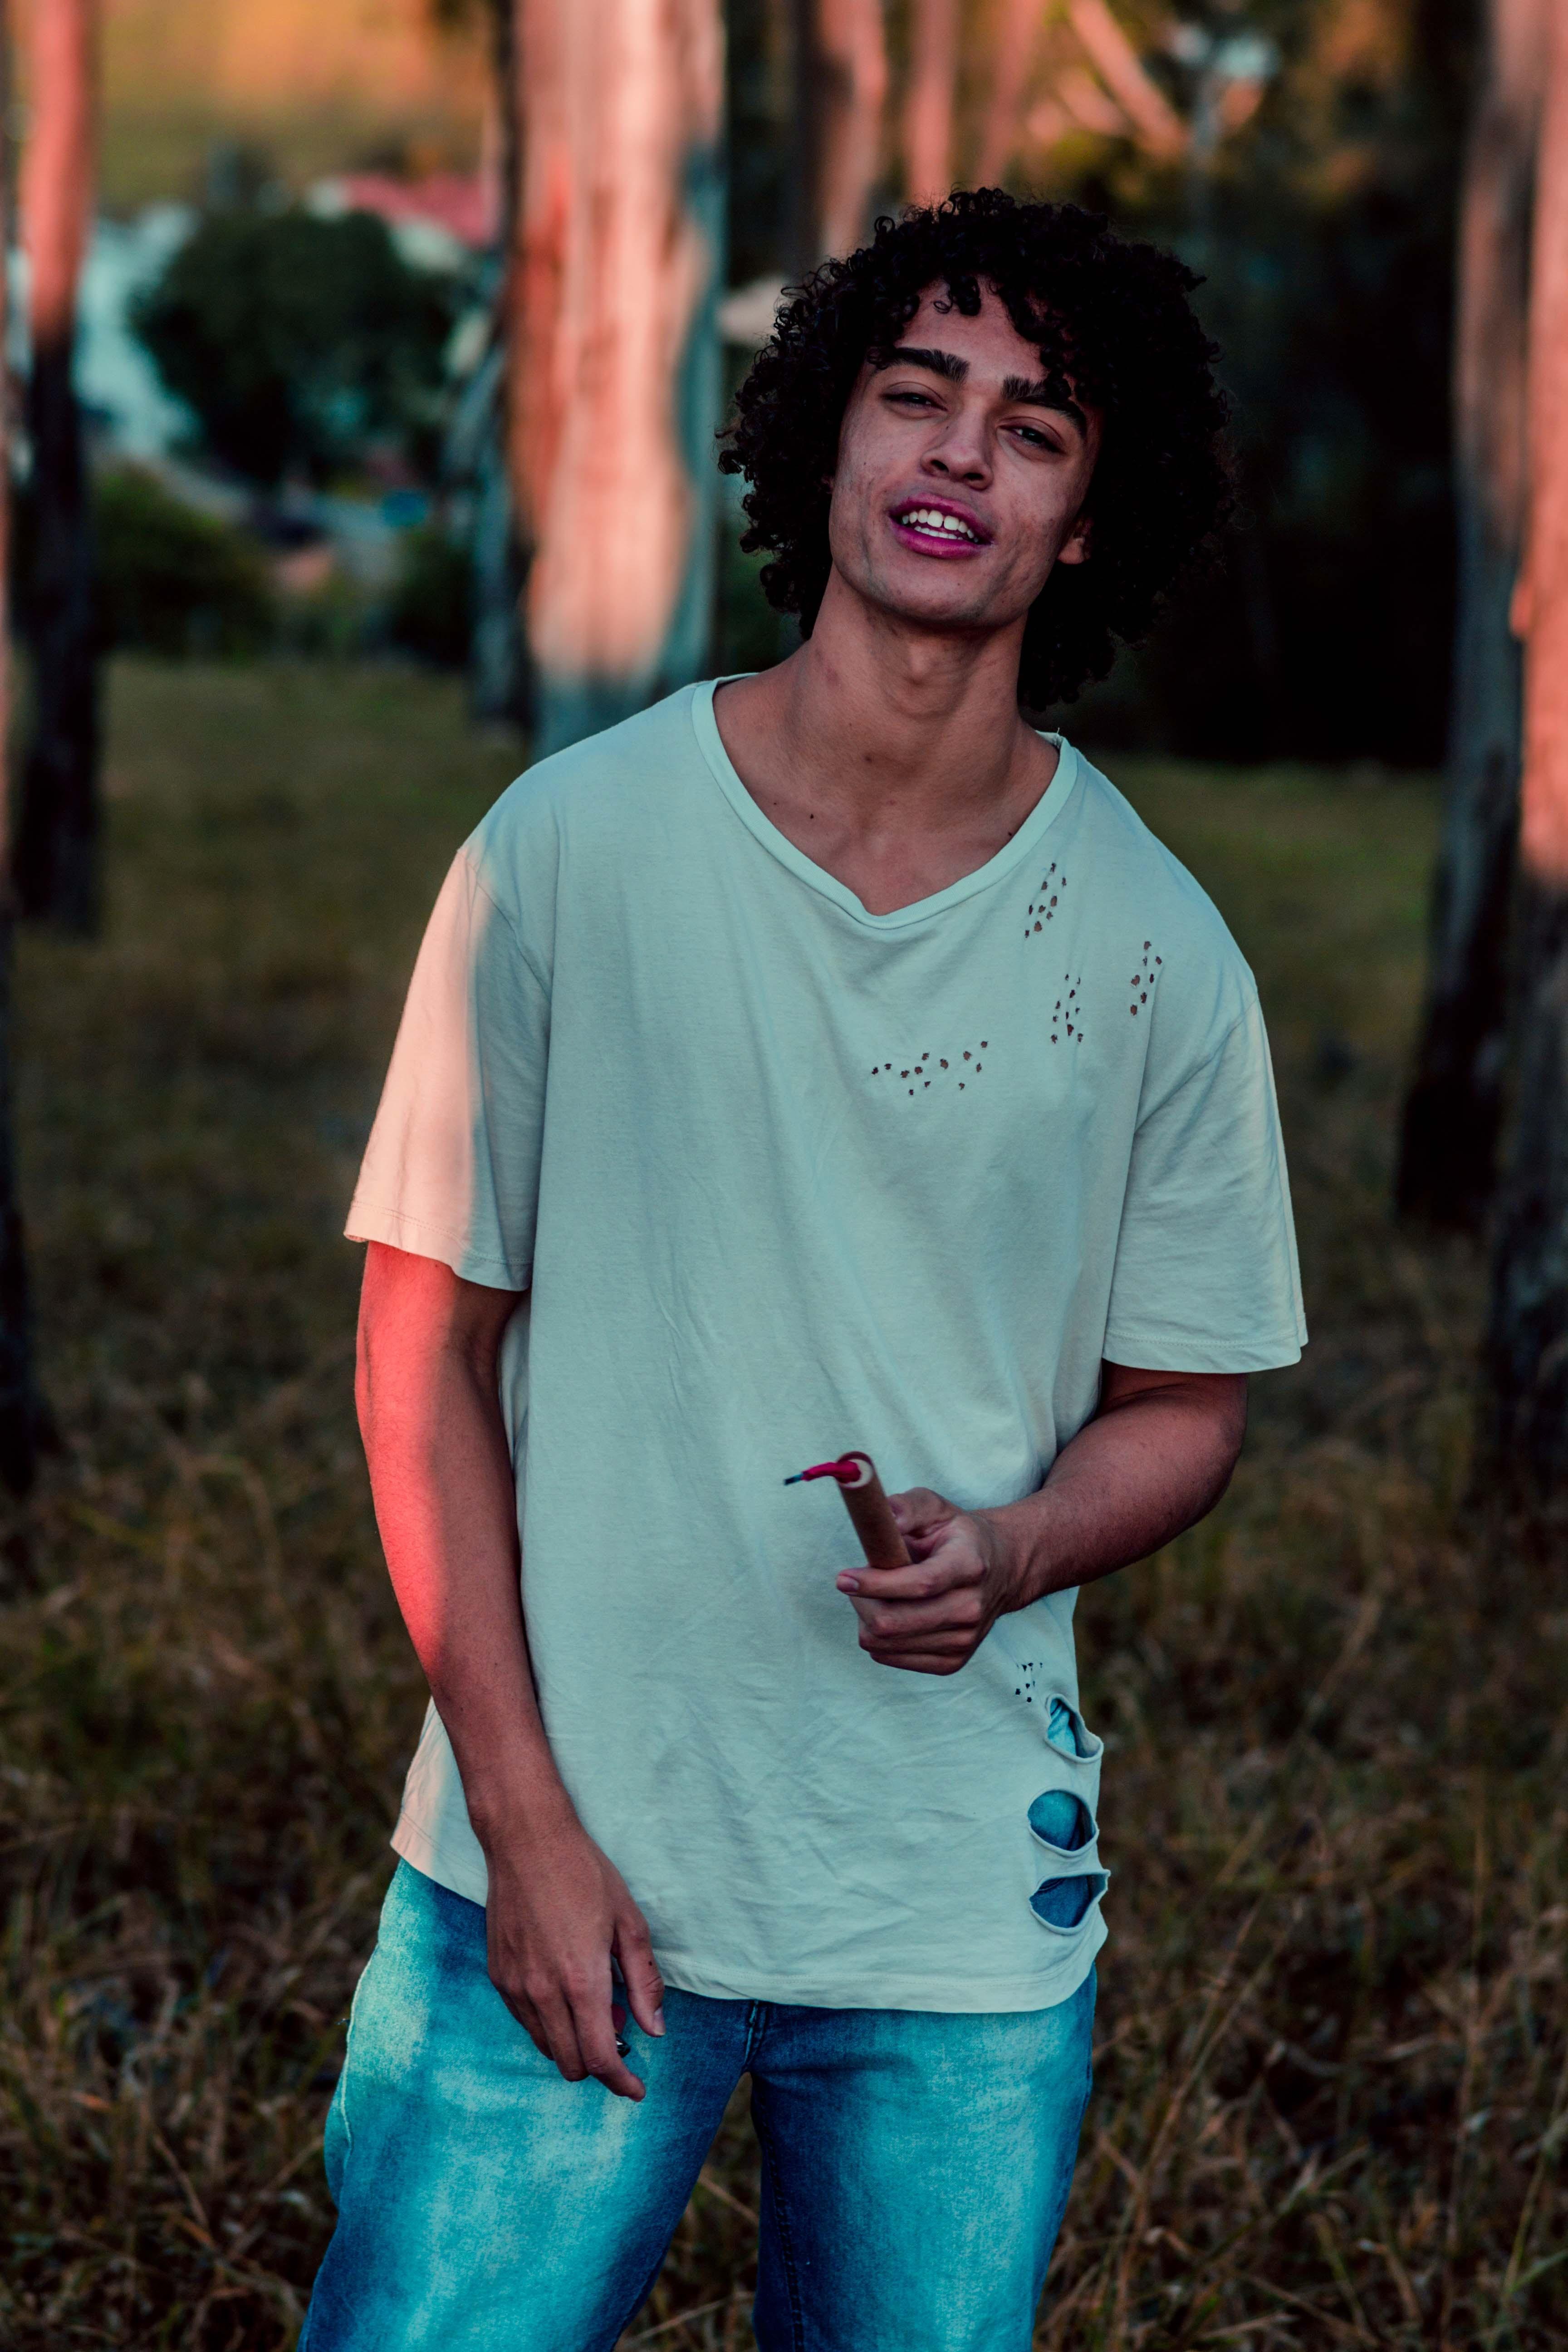 Go to Carlos Arthur M.R's profile